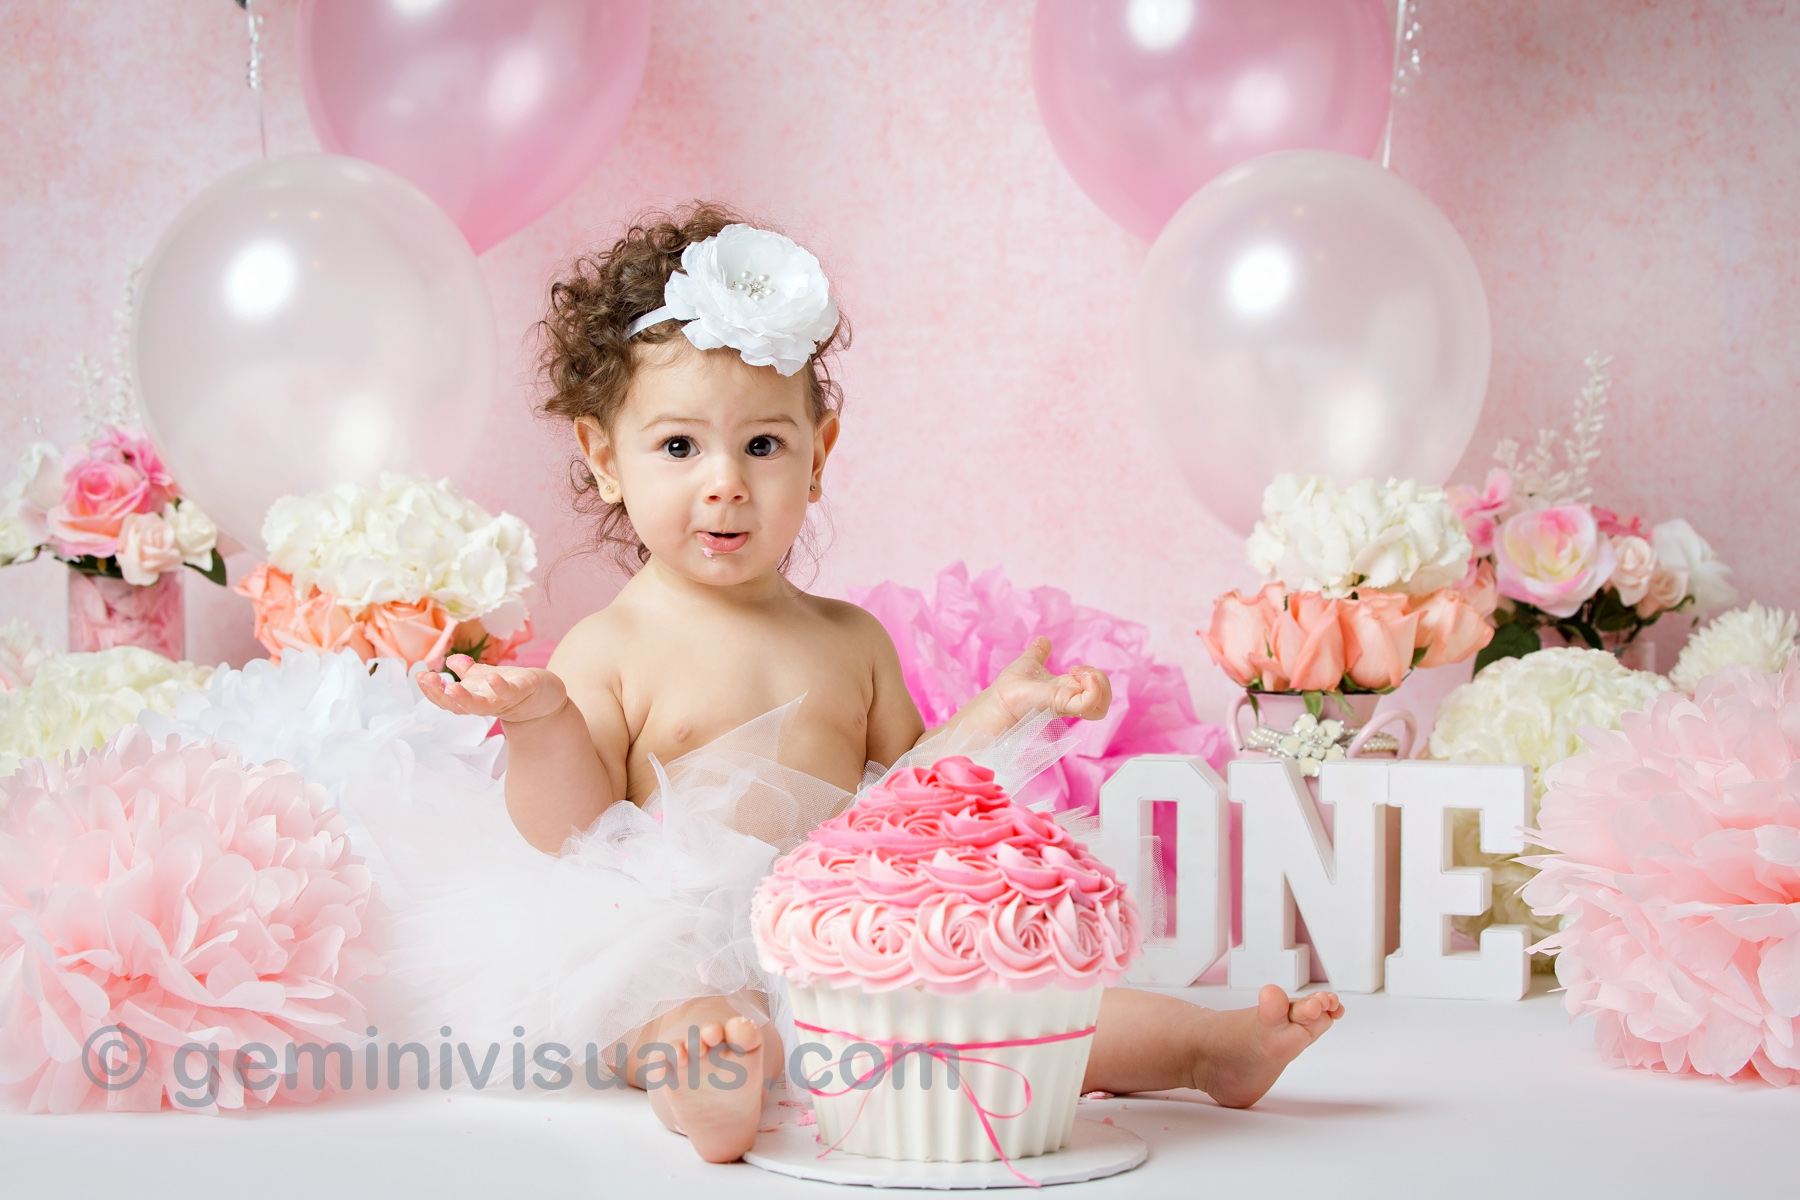 cake smash, family photos, baby turns one, maternity photography, baby photography, milestone photos, gemini visuals